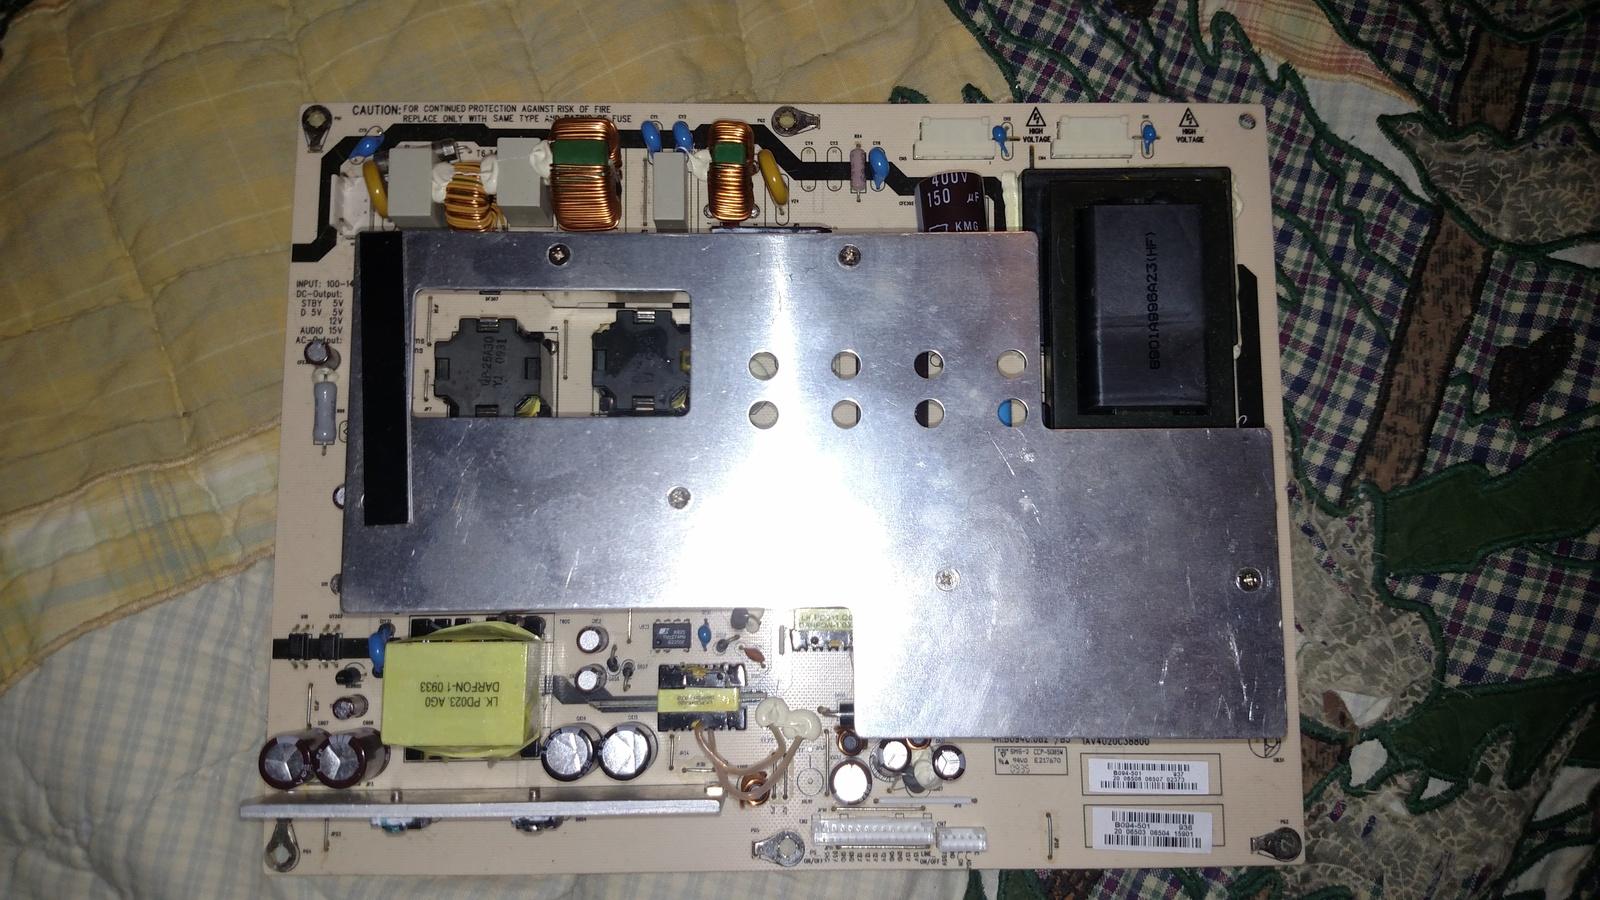 *New Replacement BELT* Sanyo Sanyo M7760K BoomBox boom box CASSETTE Player